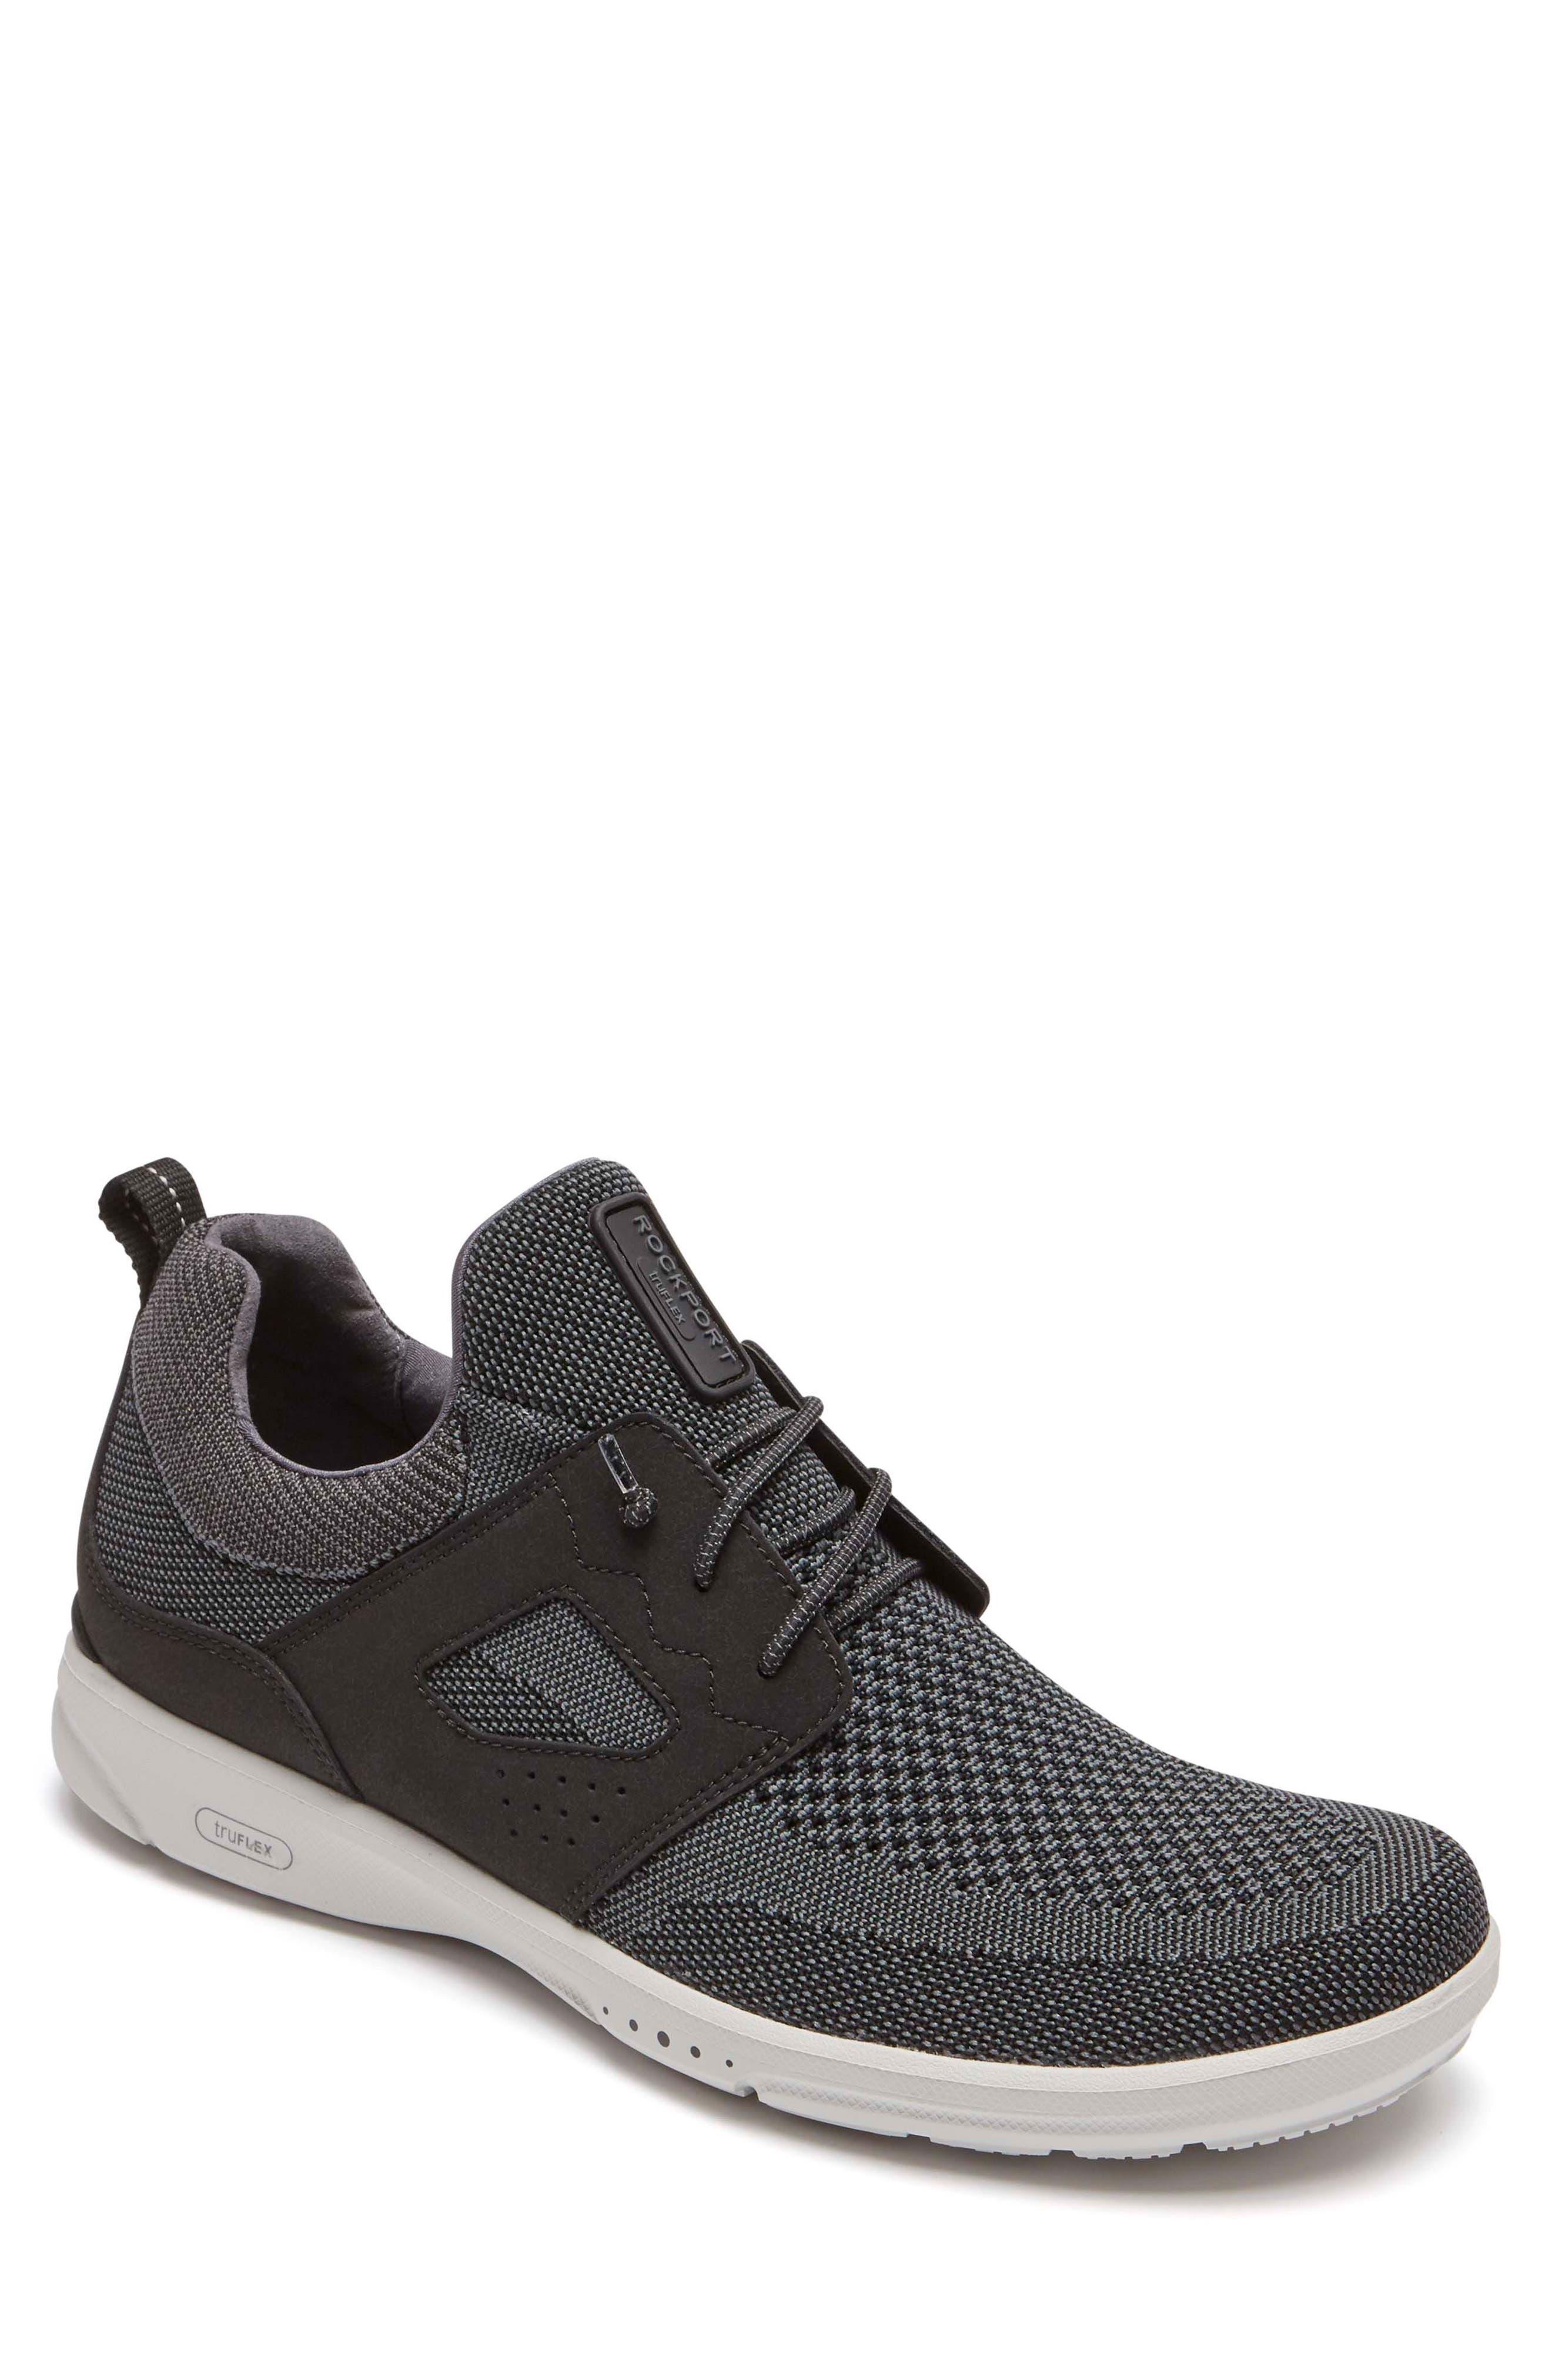 truFlex Sneaker,                         Main,                         color, BLACK LEATHER